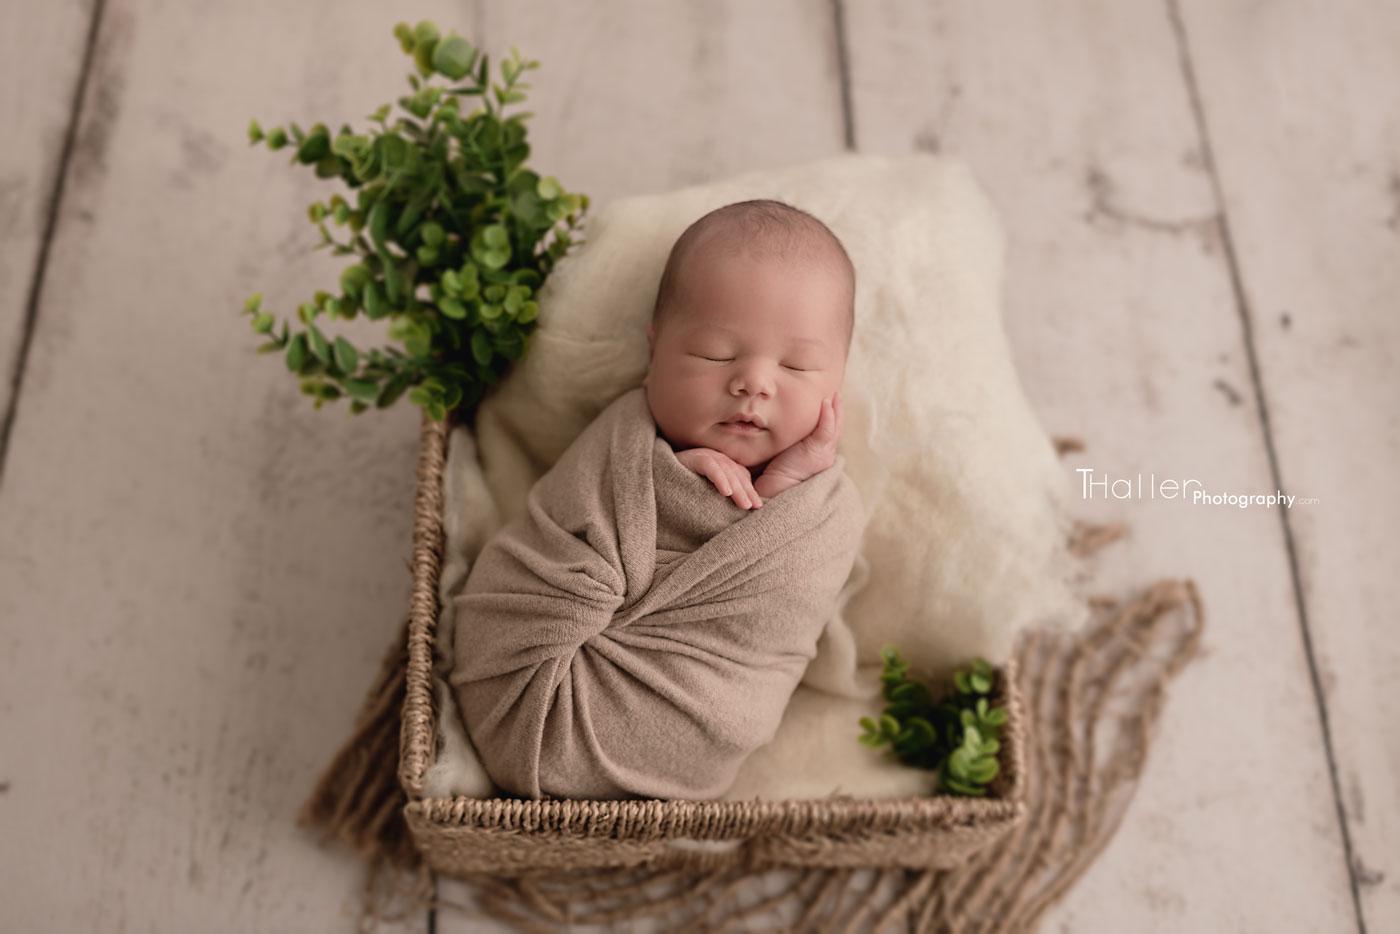 newborn boy sleeping in a basket decorated with greenery